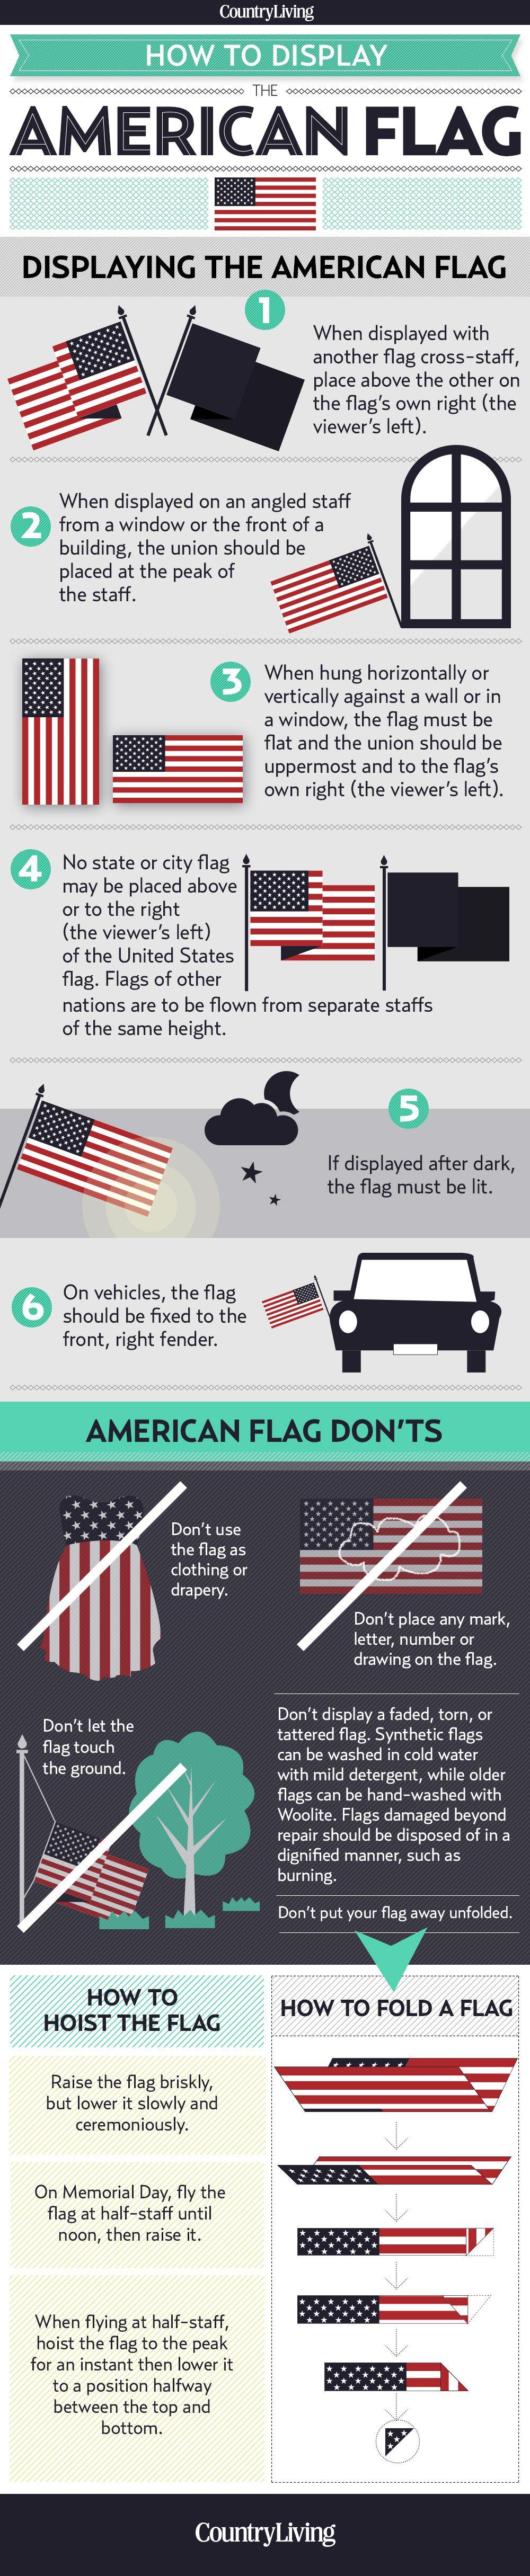 displaying the flag proper american flag etiquette flags display and american flag etiquette. Black Bedroom Furniture Sets. Home Design Ideas